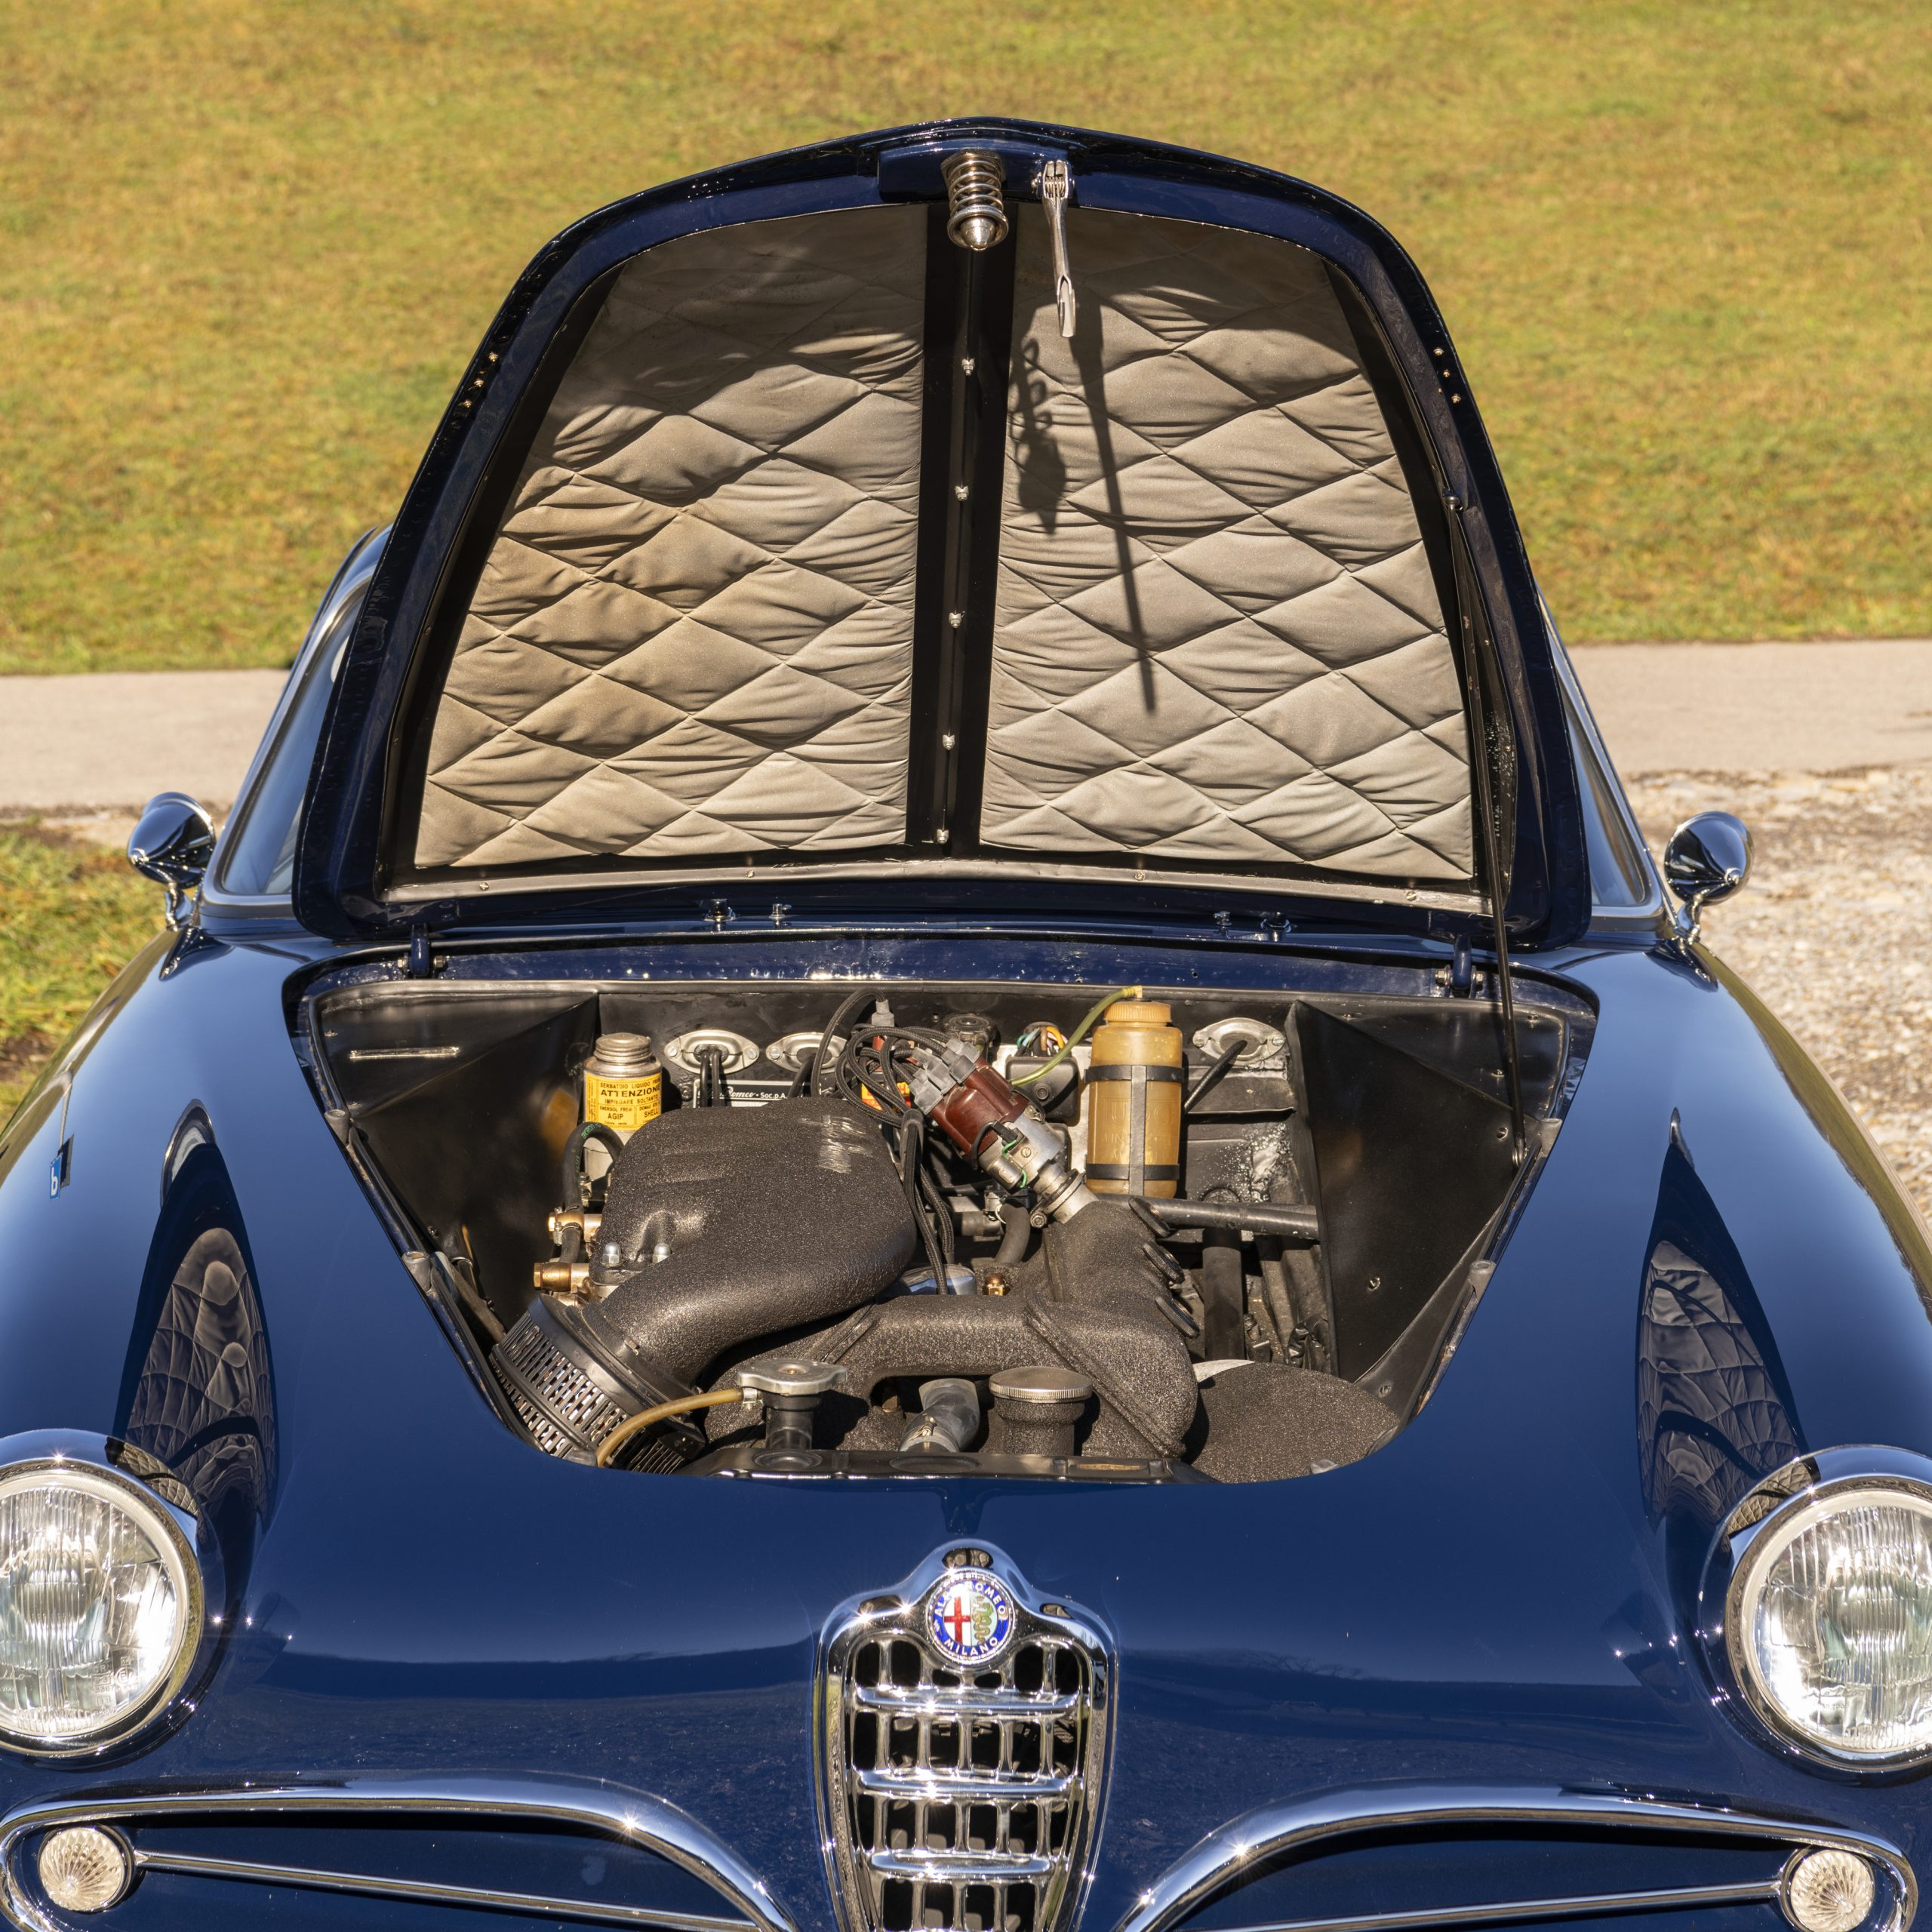 Alfa Romeo 1900C Super Sprint Coupe engine bay